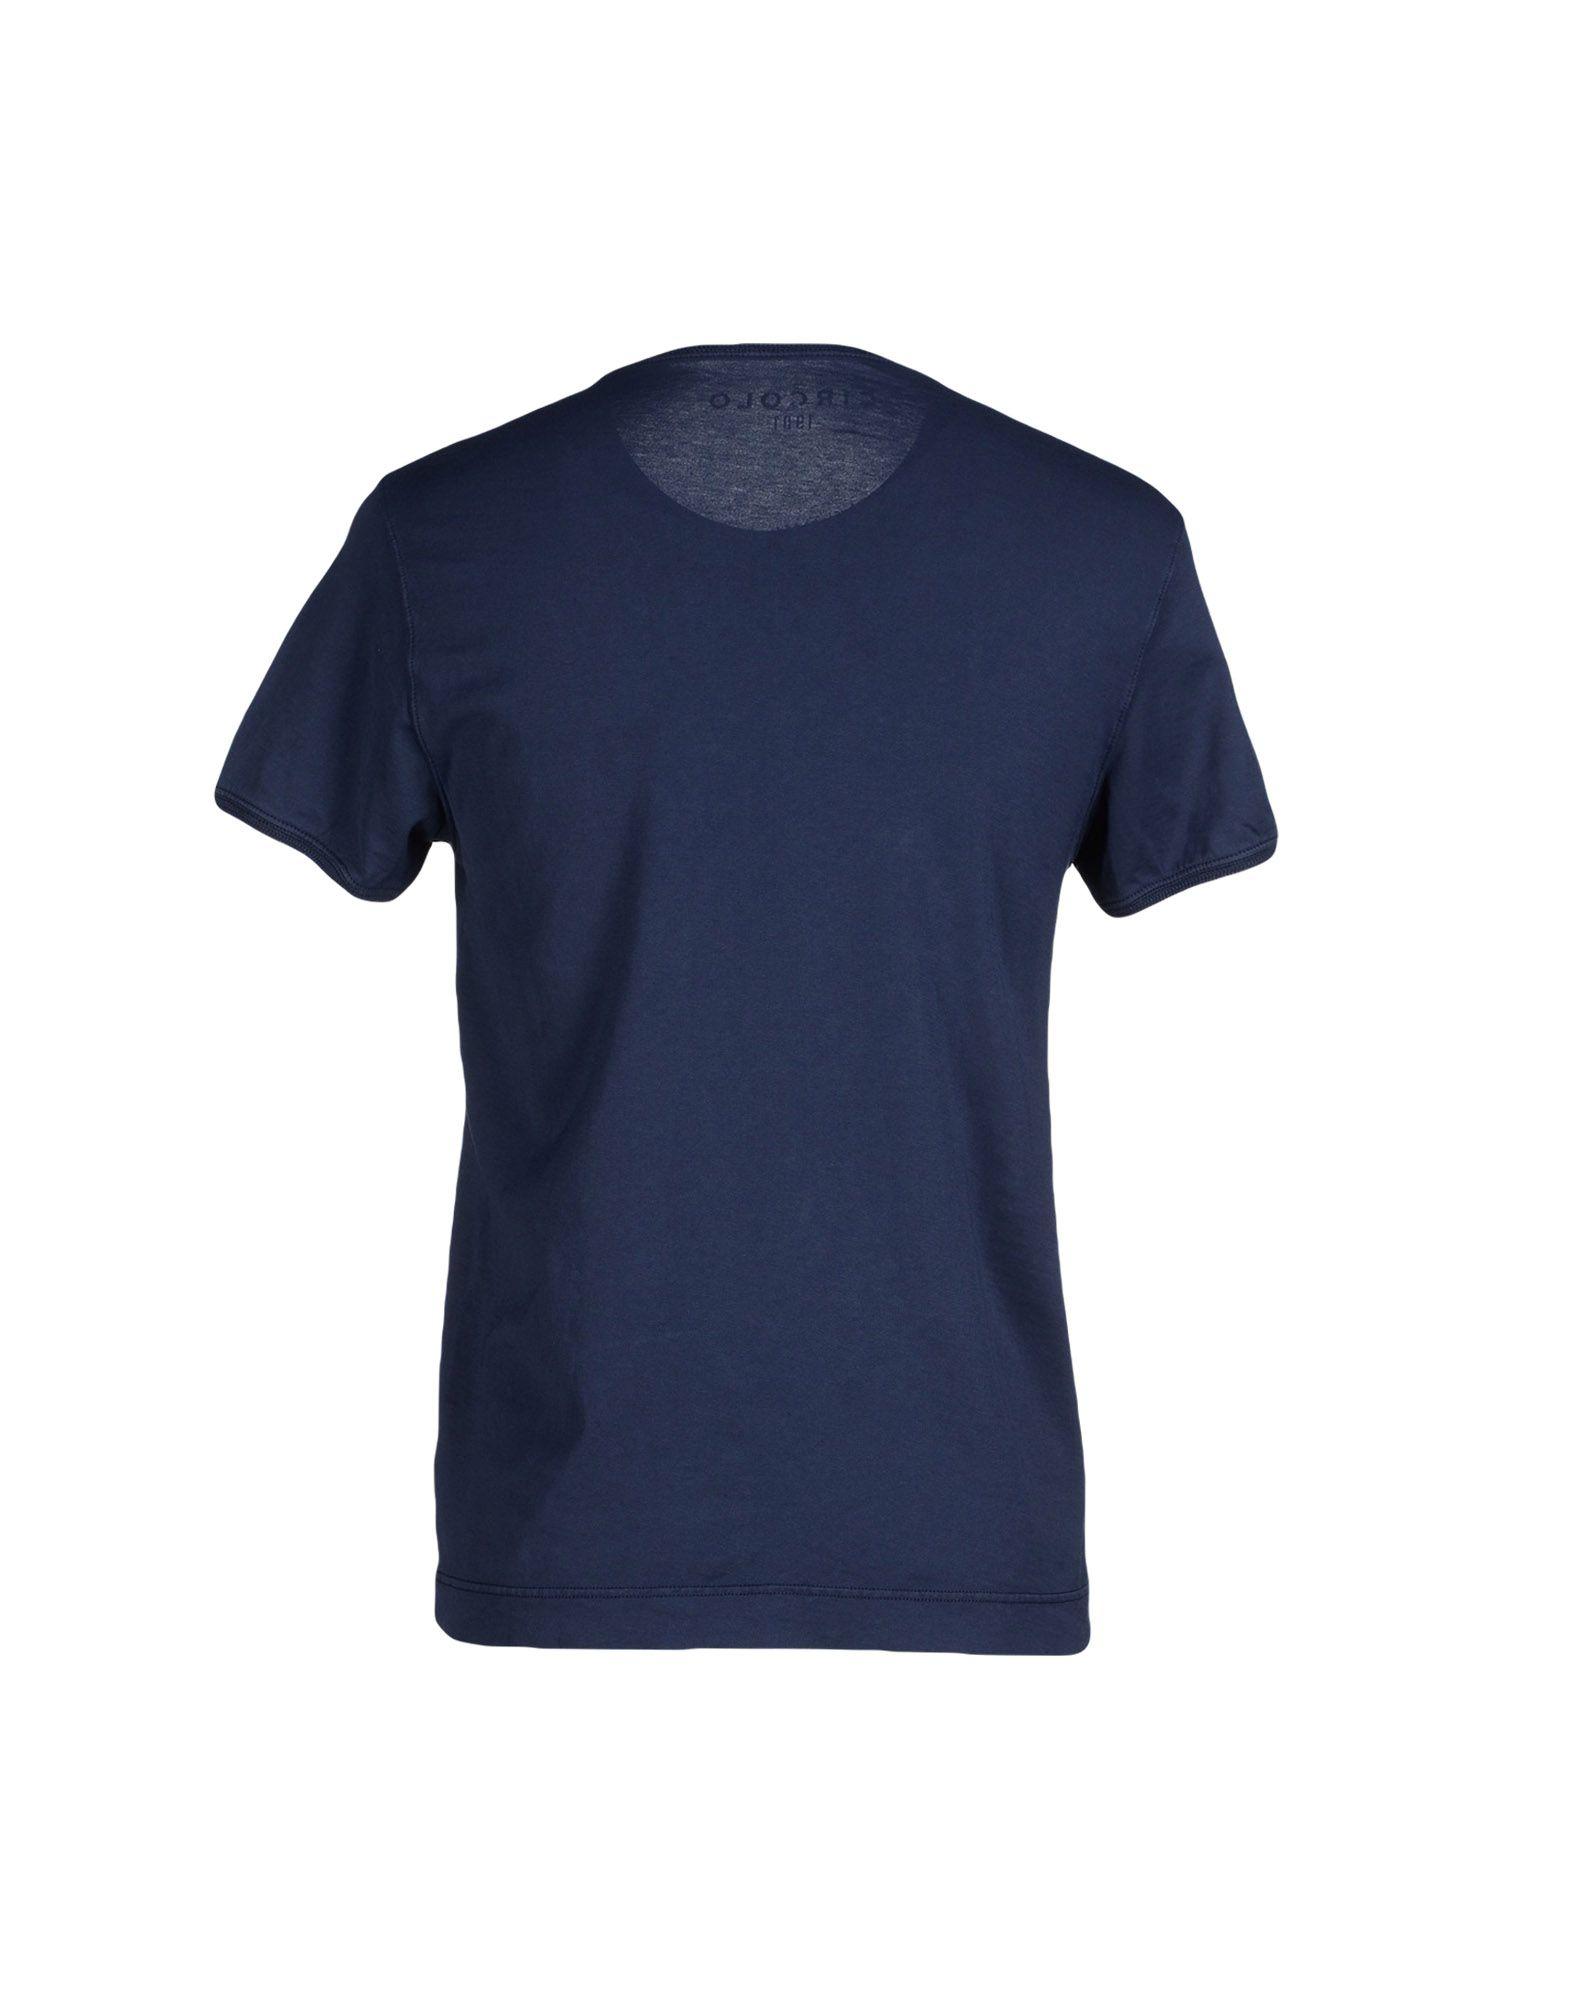 Circolo 1901 t shirt in blue for men dark blue lyst for T shirt dark blue